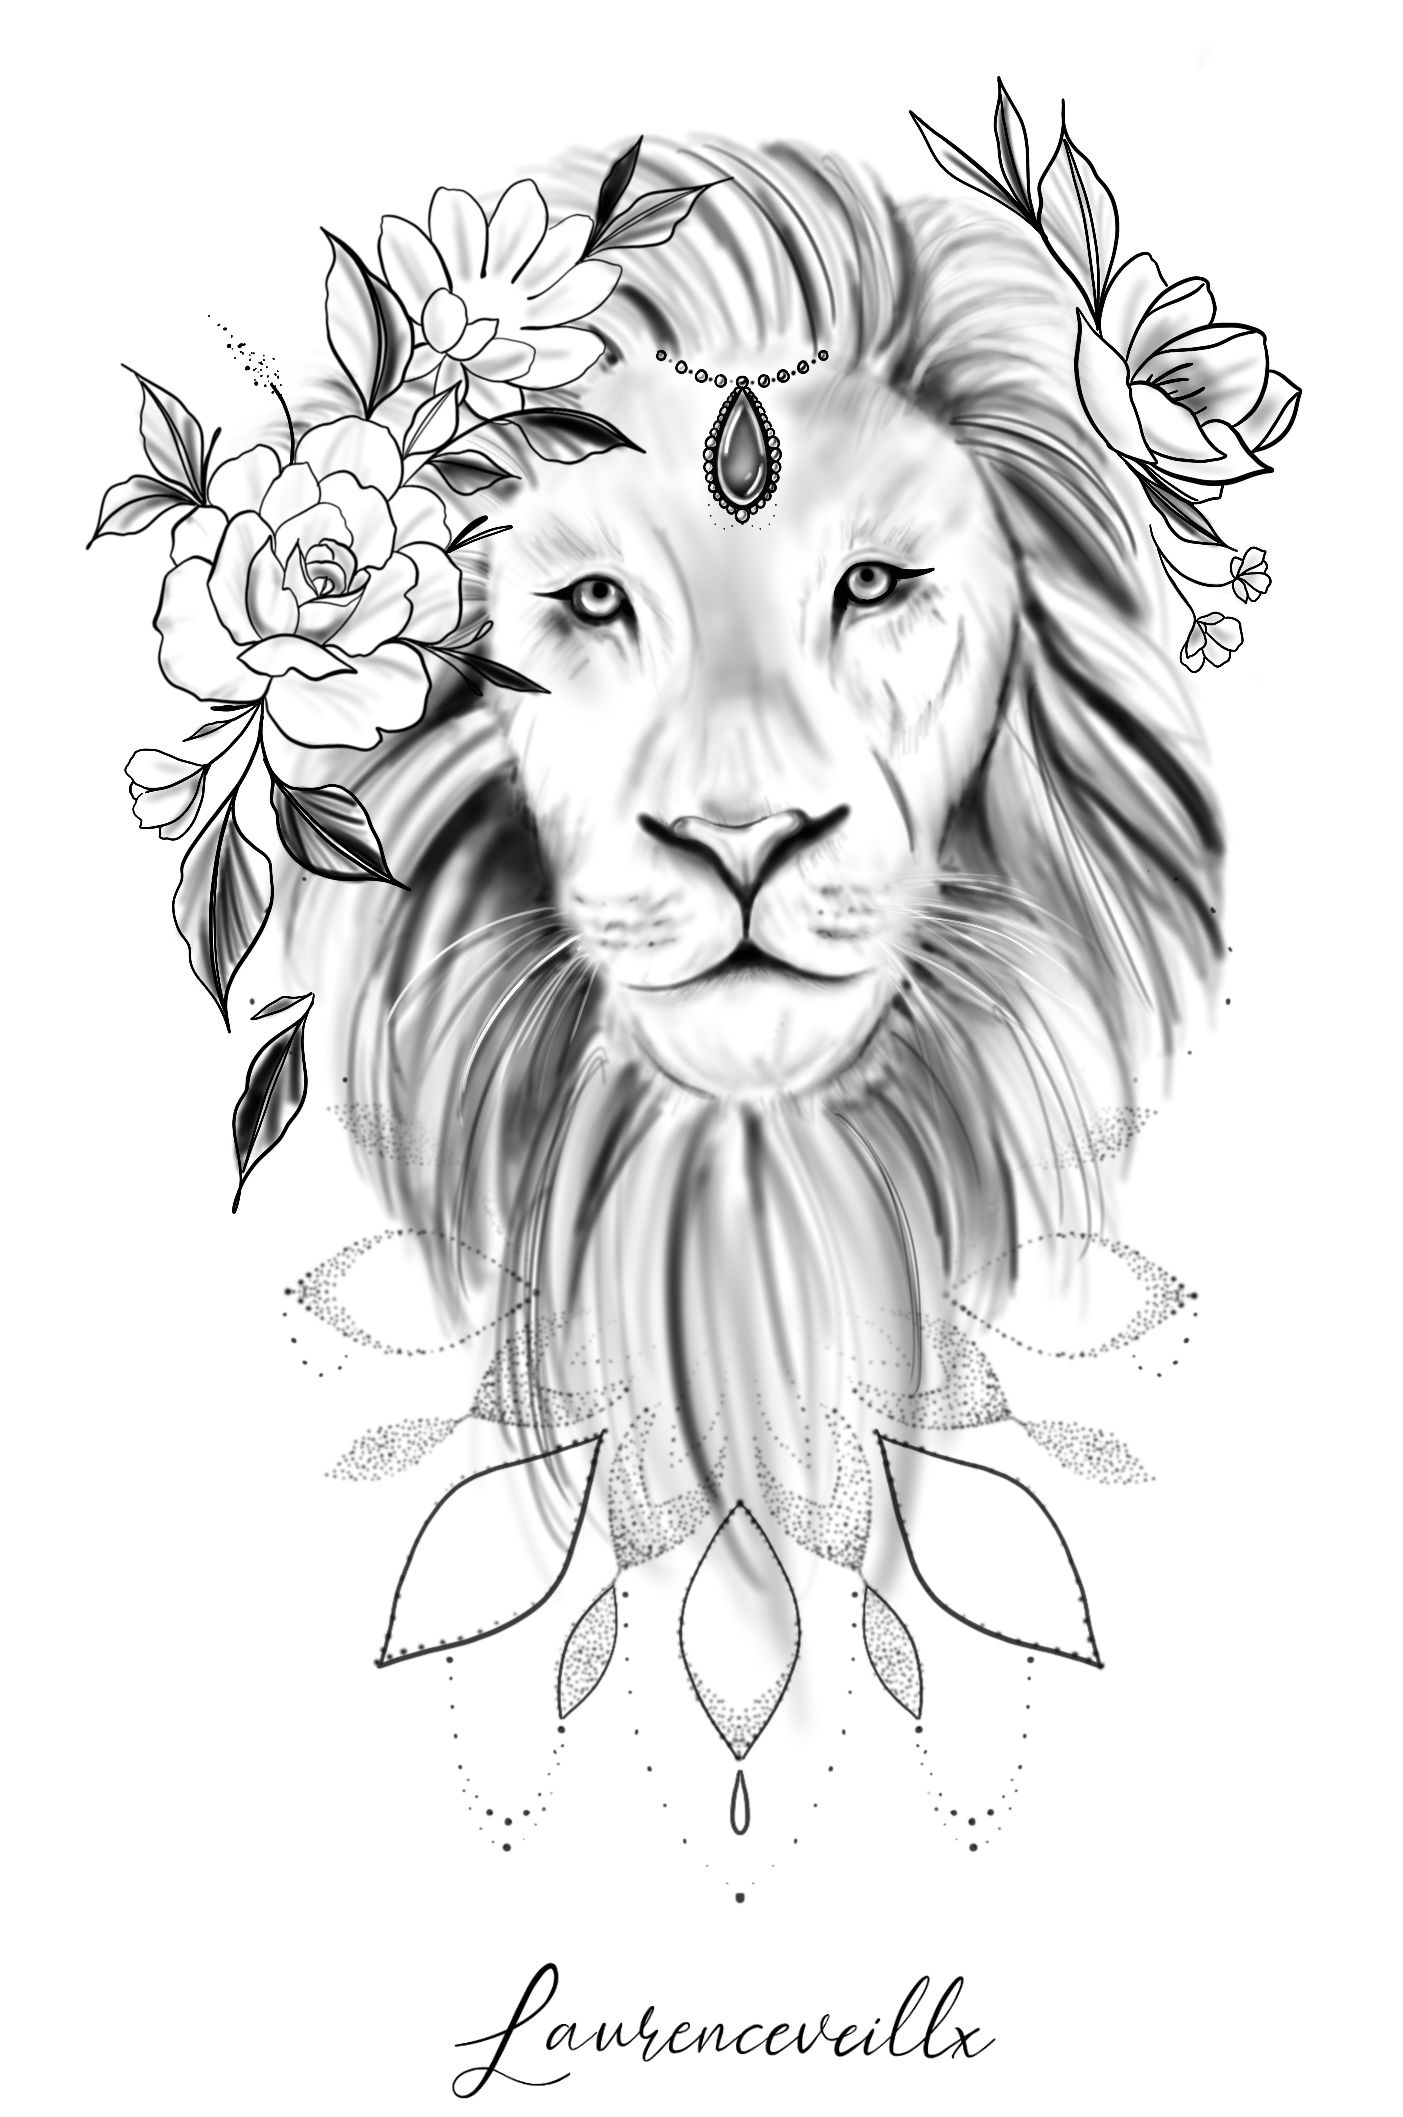 34+ Tete de lion dessin tatouage ideas